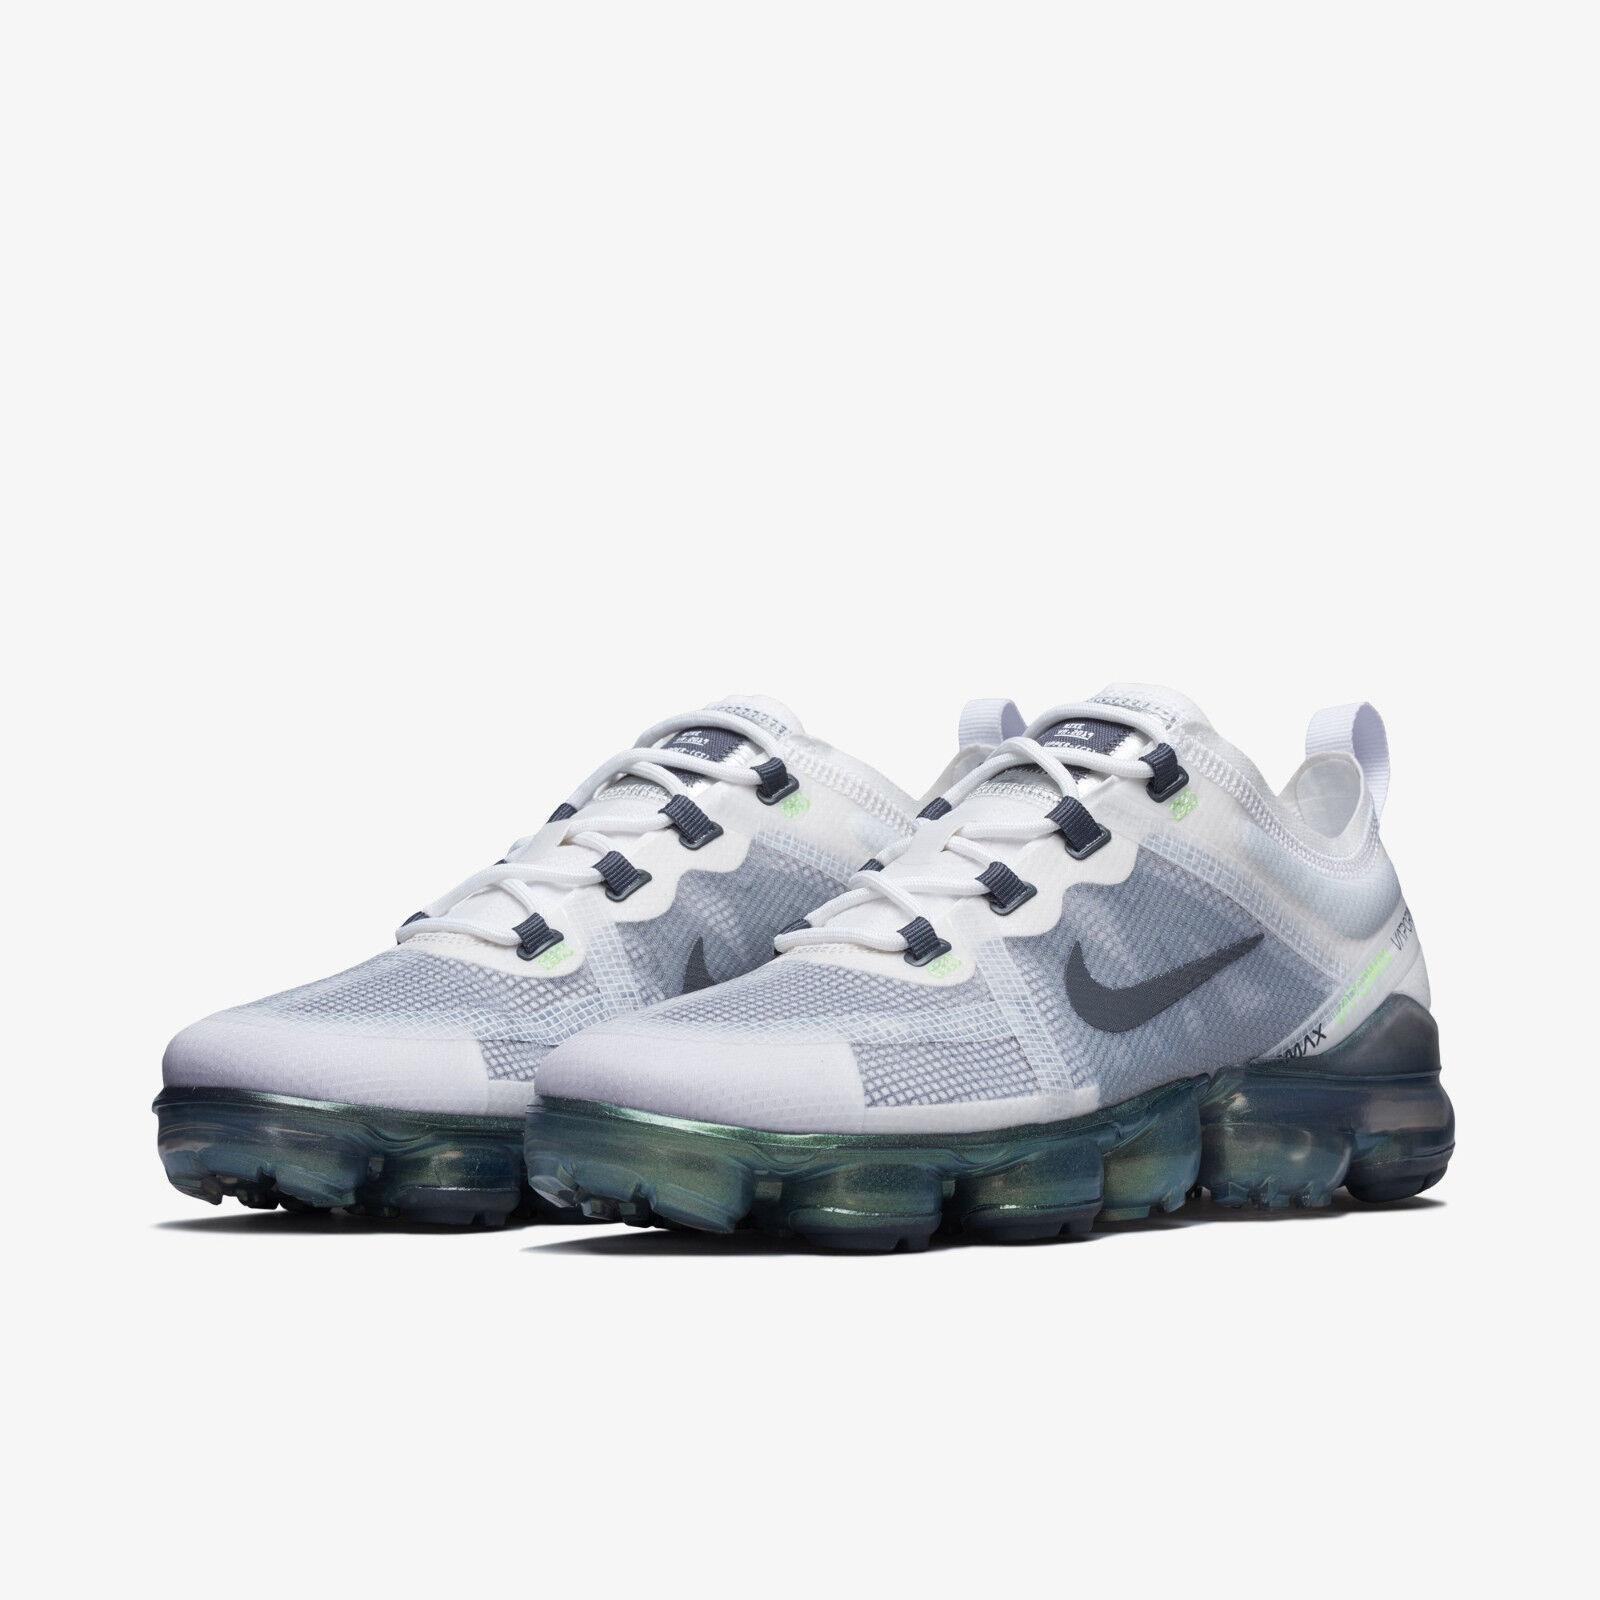 5385176ba NIKE Air VaporMax 2019 Premium AT6810-100 White Platinum Tint Mens shoes